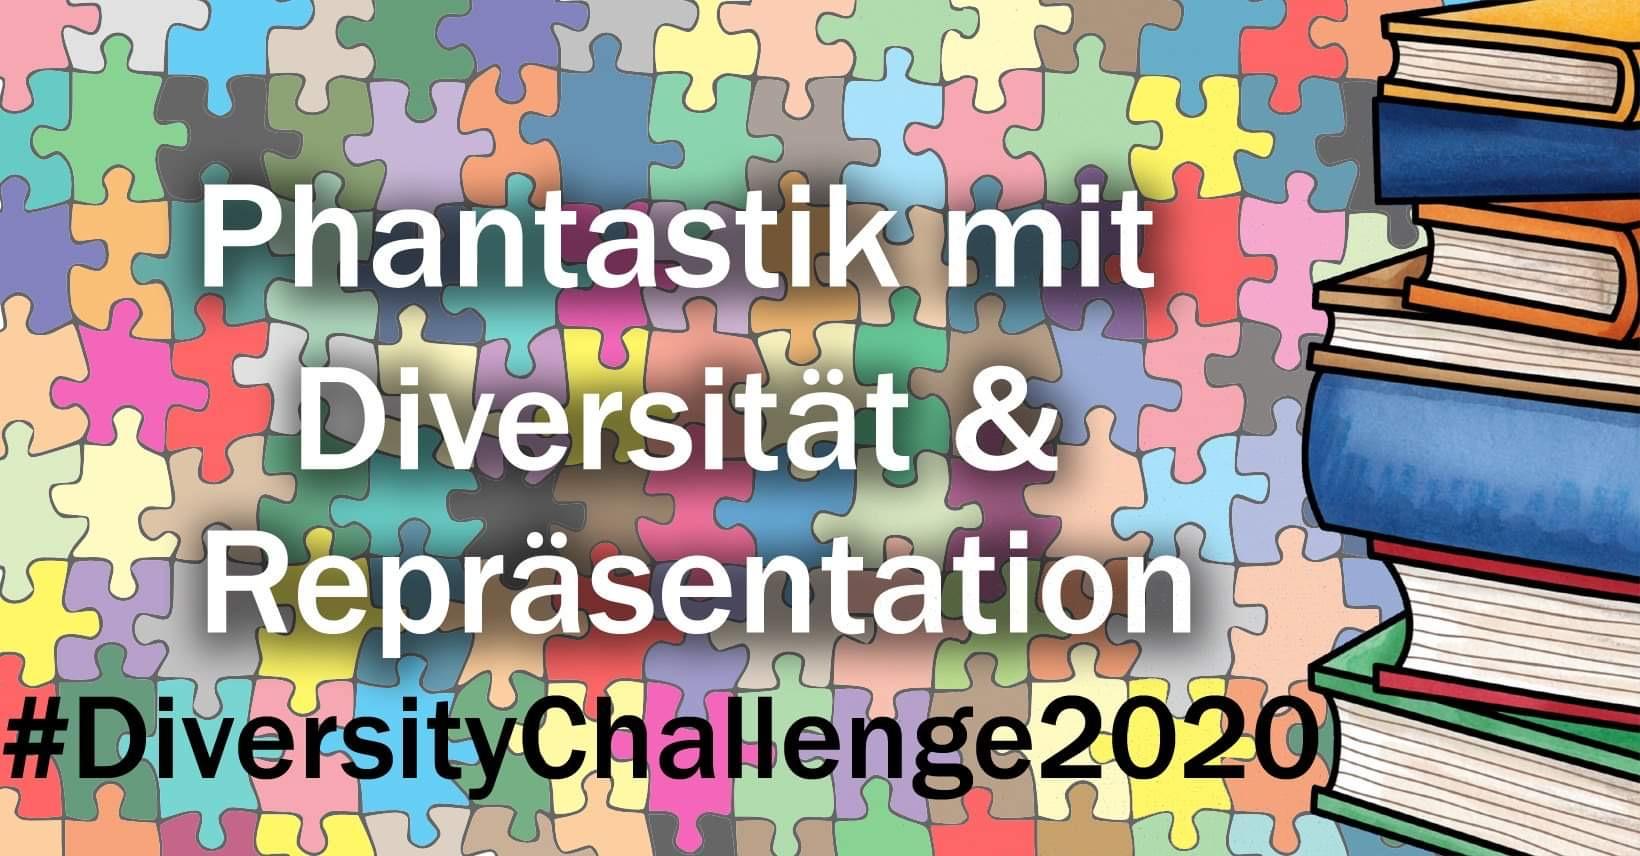 Diversity Challenge 2020